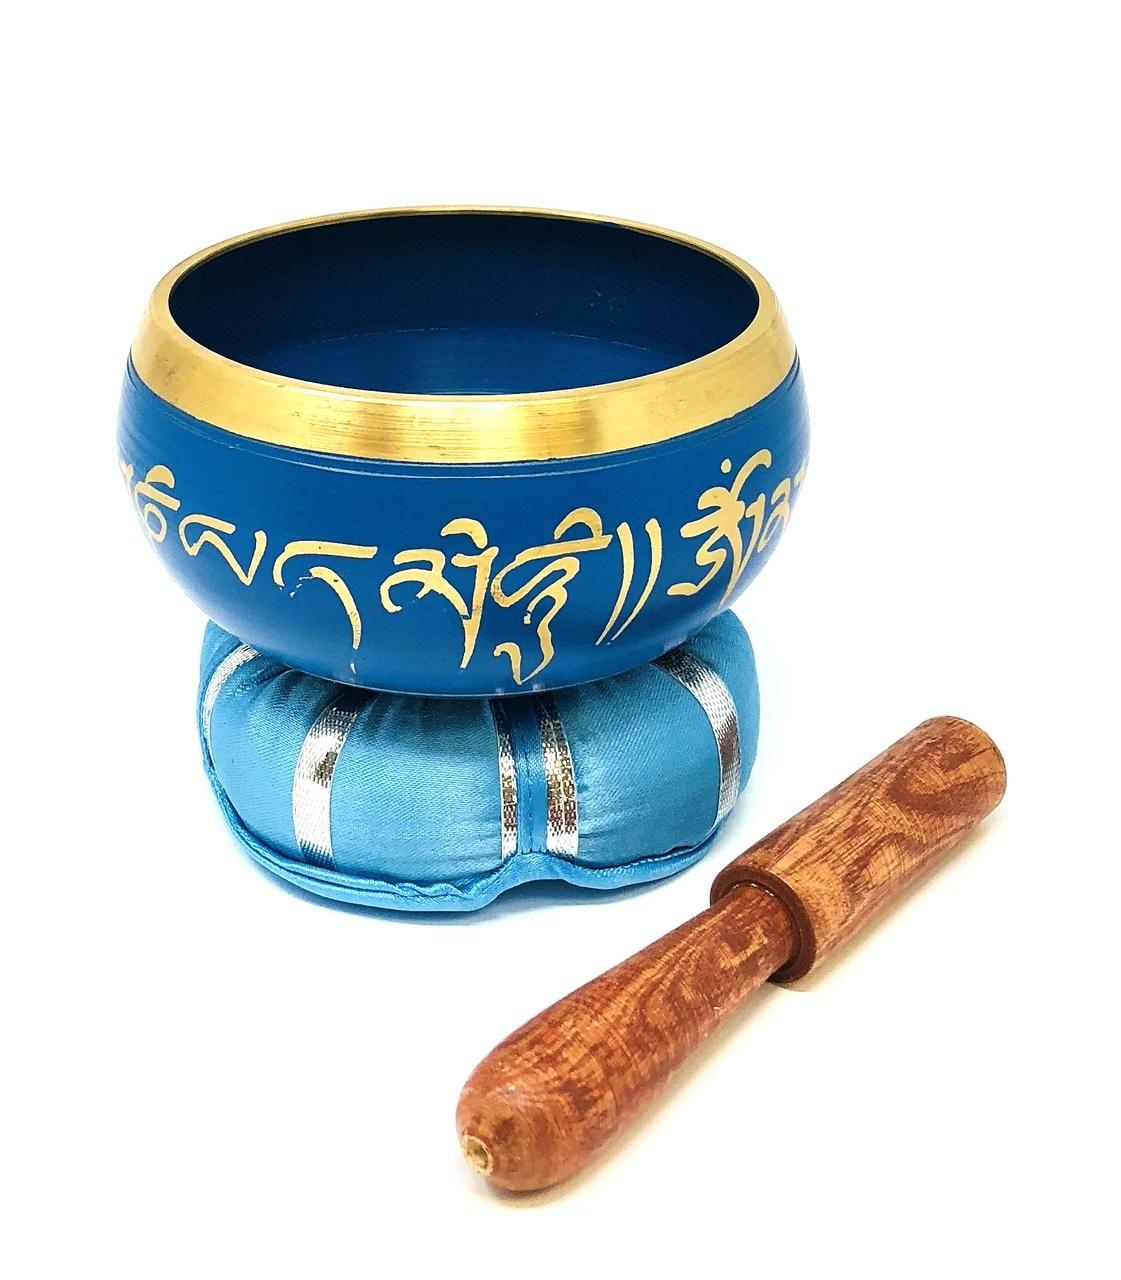 Tibetan Singing Bowl Blue with Mallet $34.99